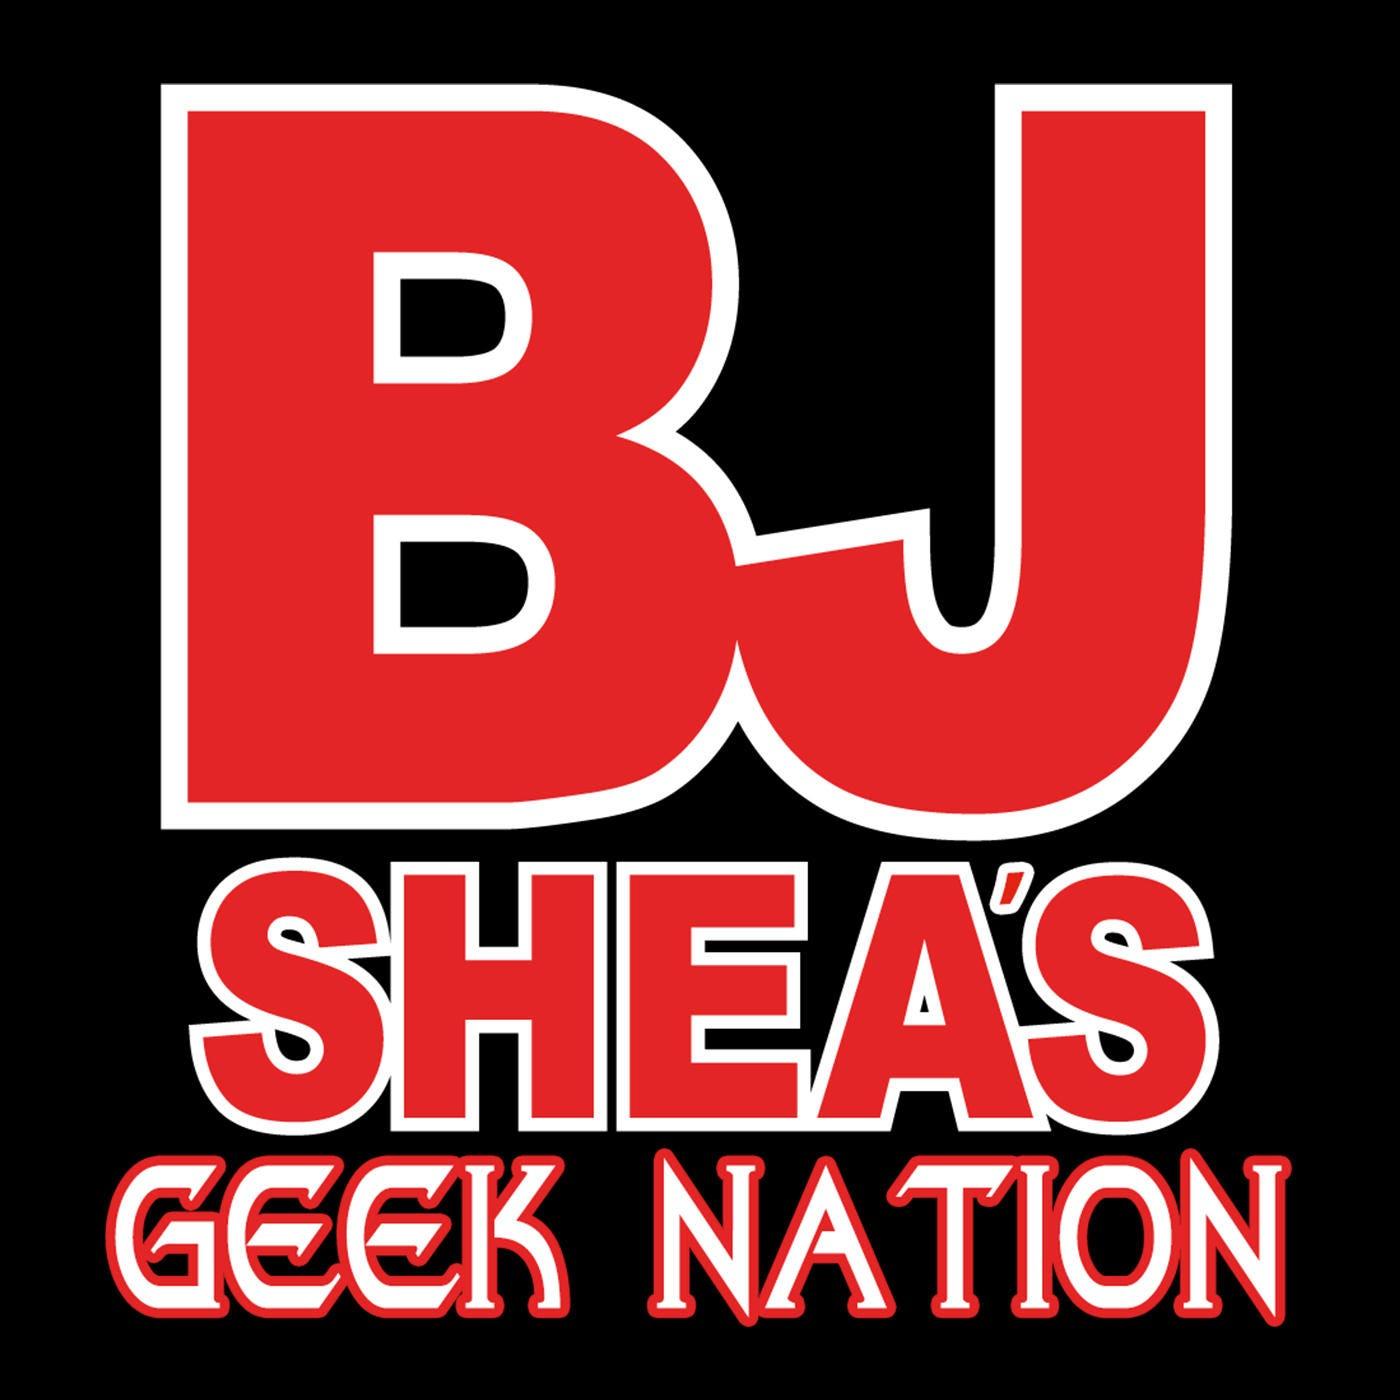 BJ Shea's Geek Nation